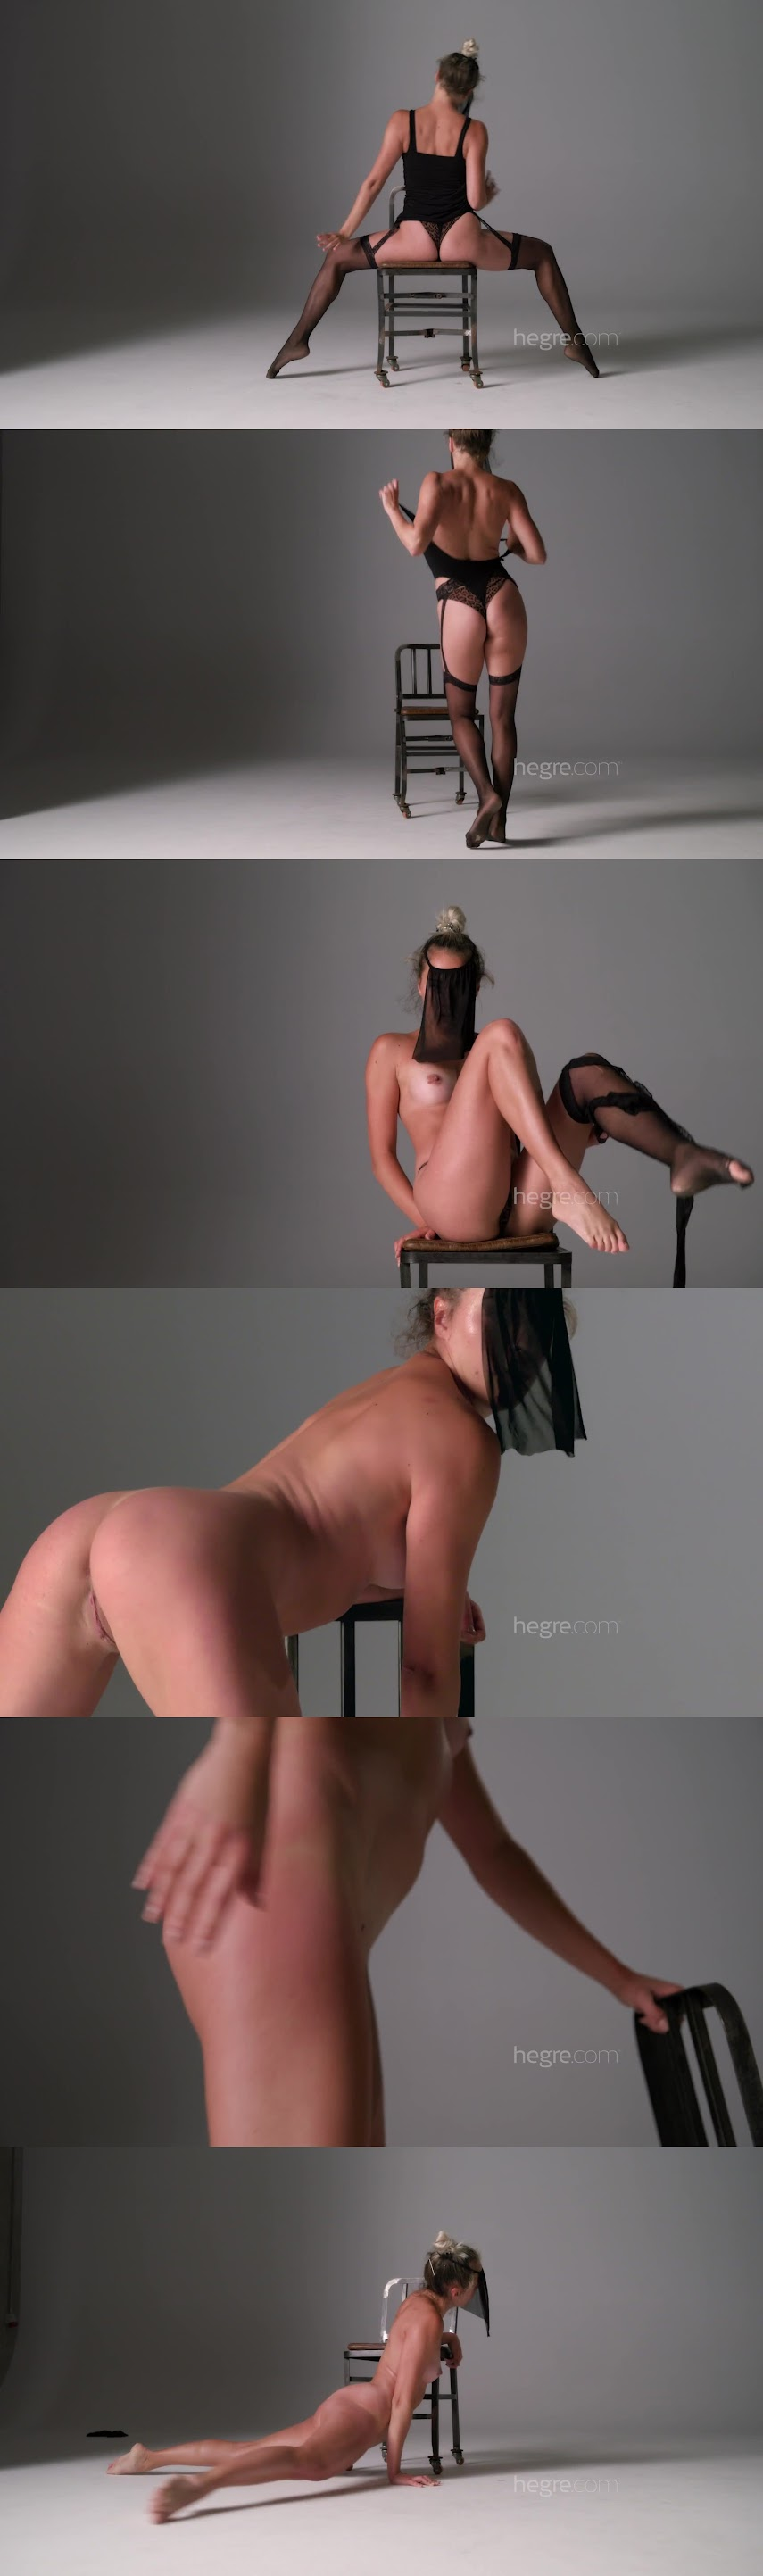 [Art] Amanda Striptease